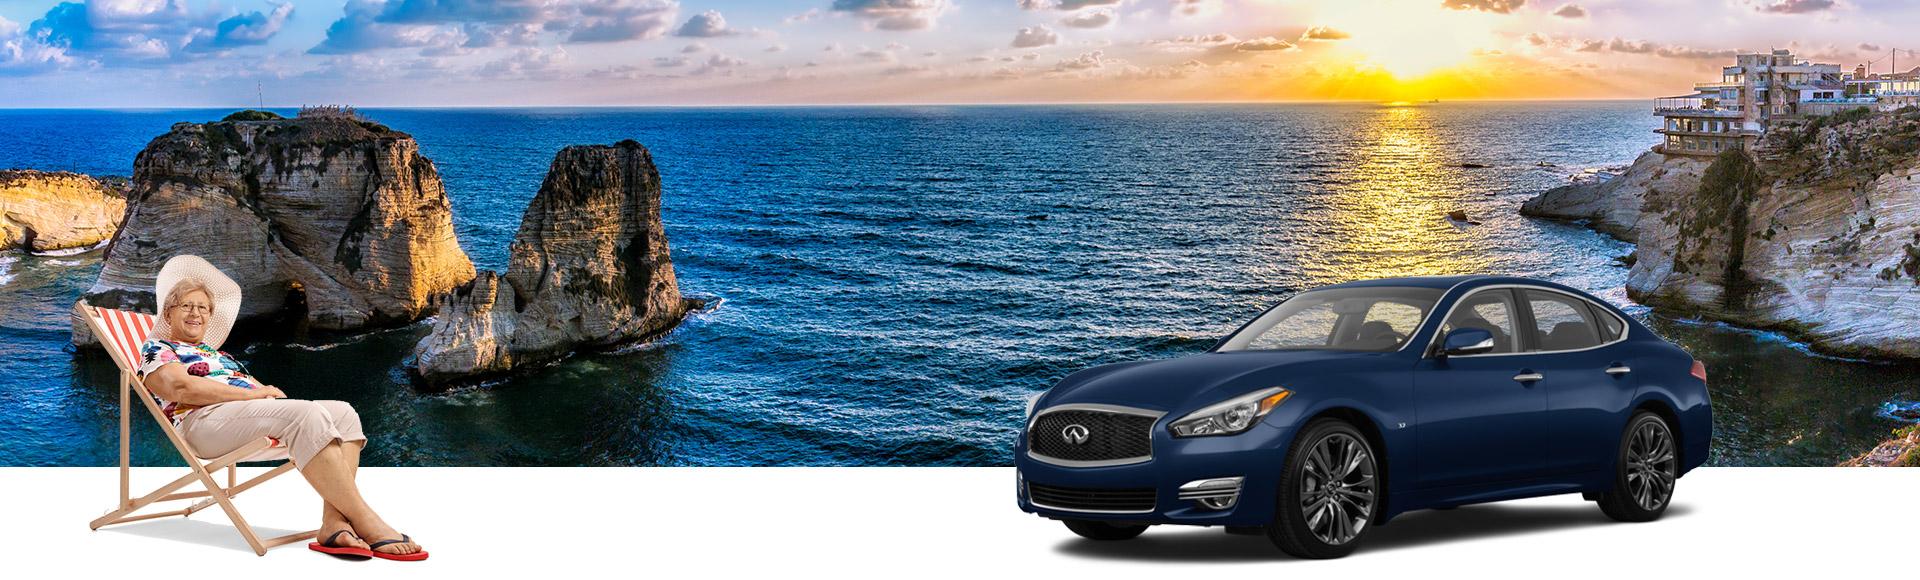 Advanced Car Rental Services Lebanon